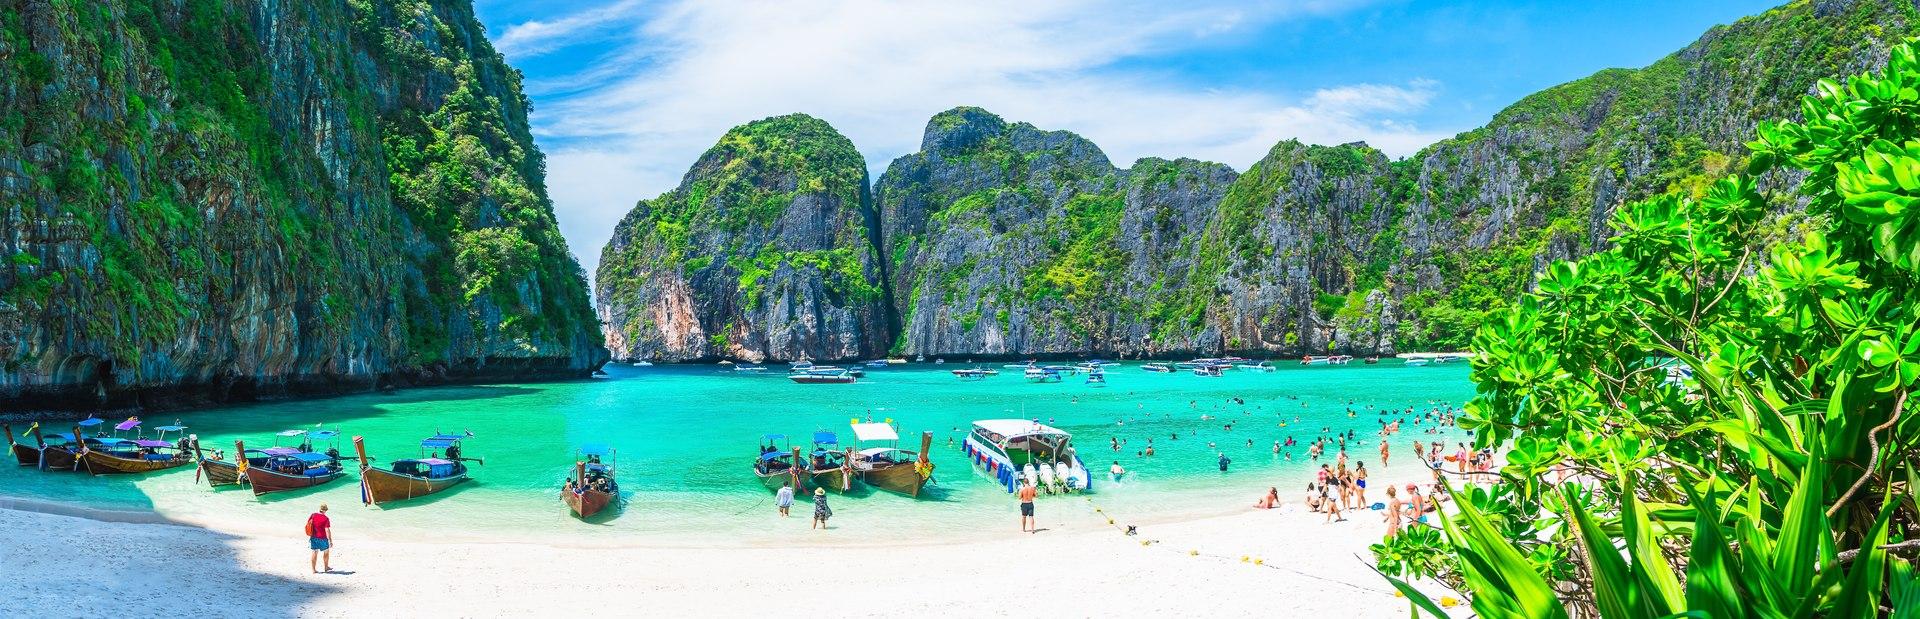 Thailand climate photo